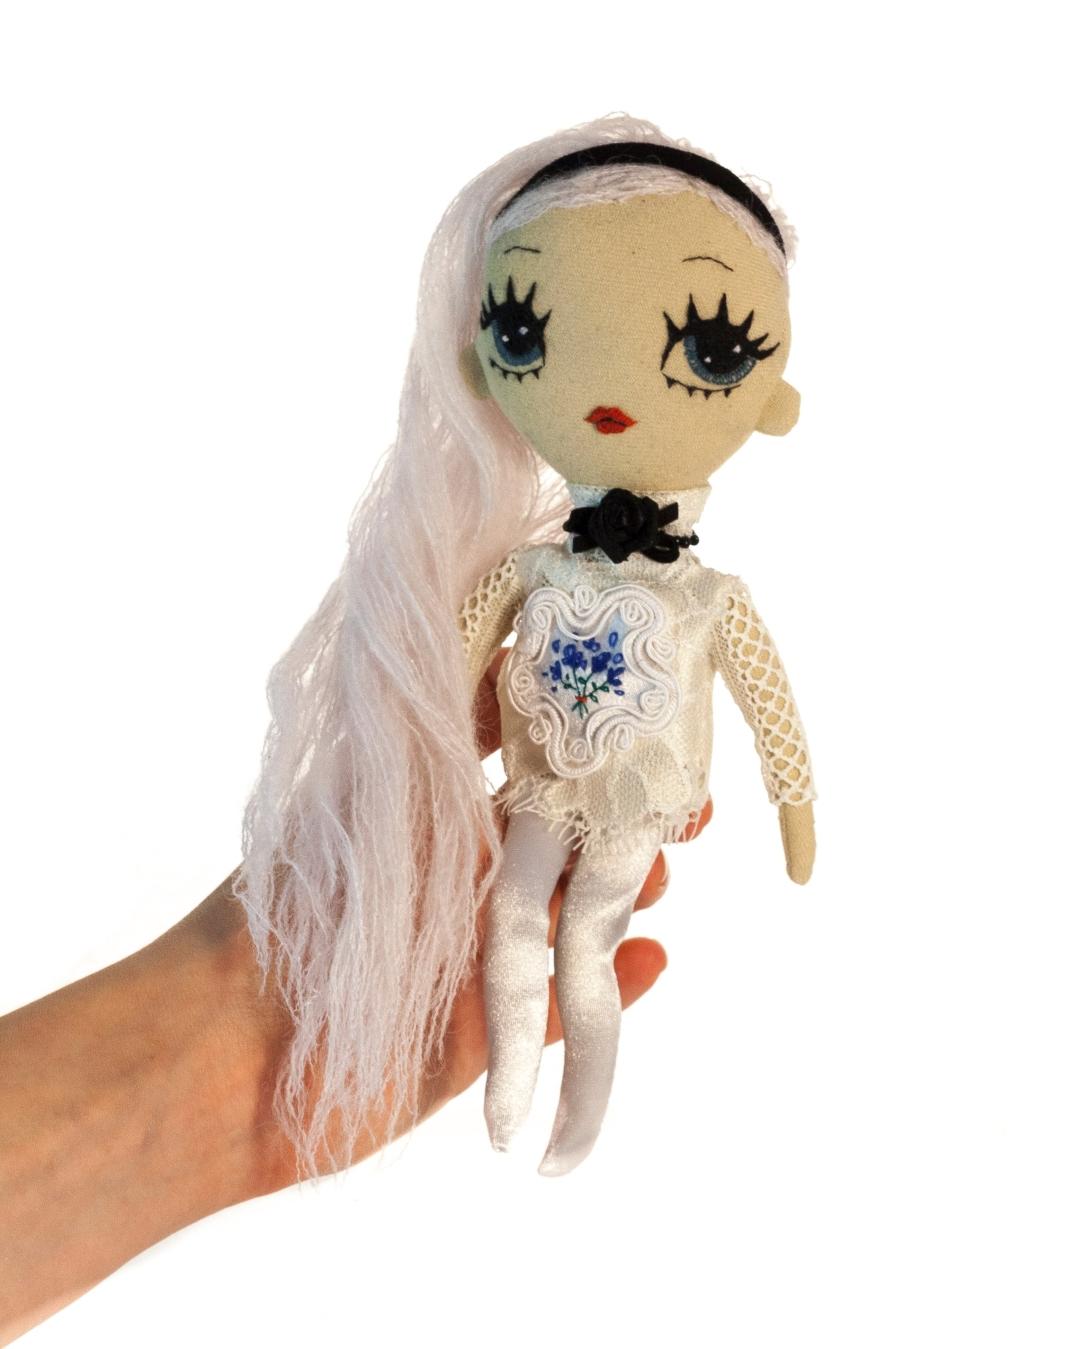 Dollcloud Lilly handmade fabric fashion doll